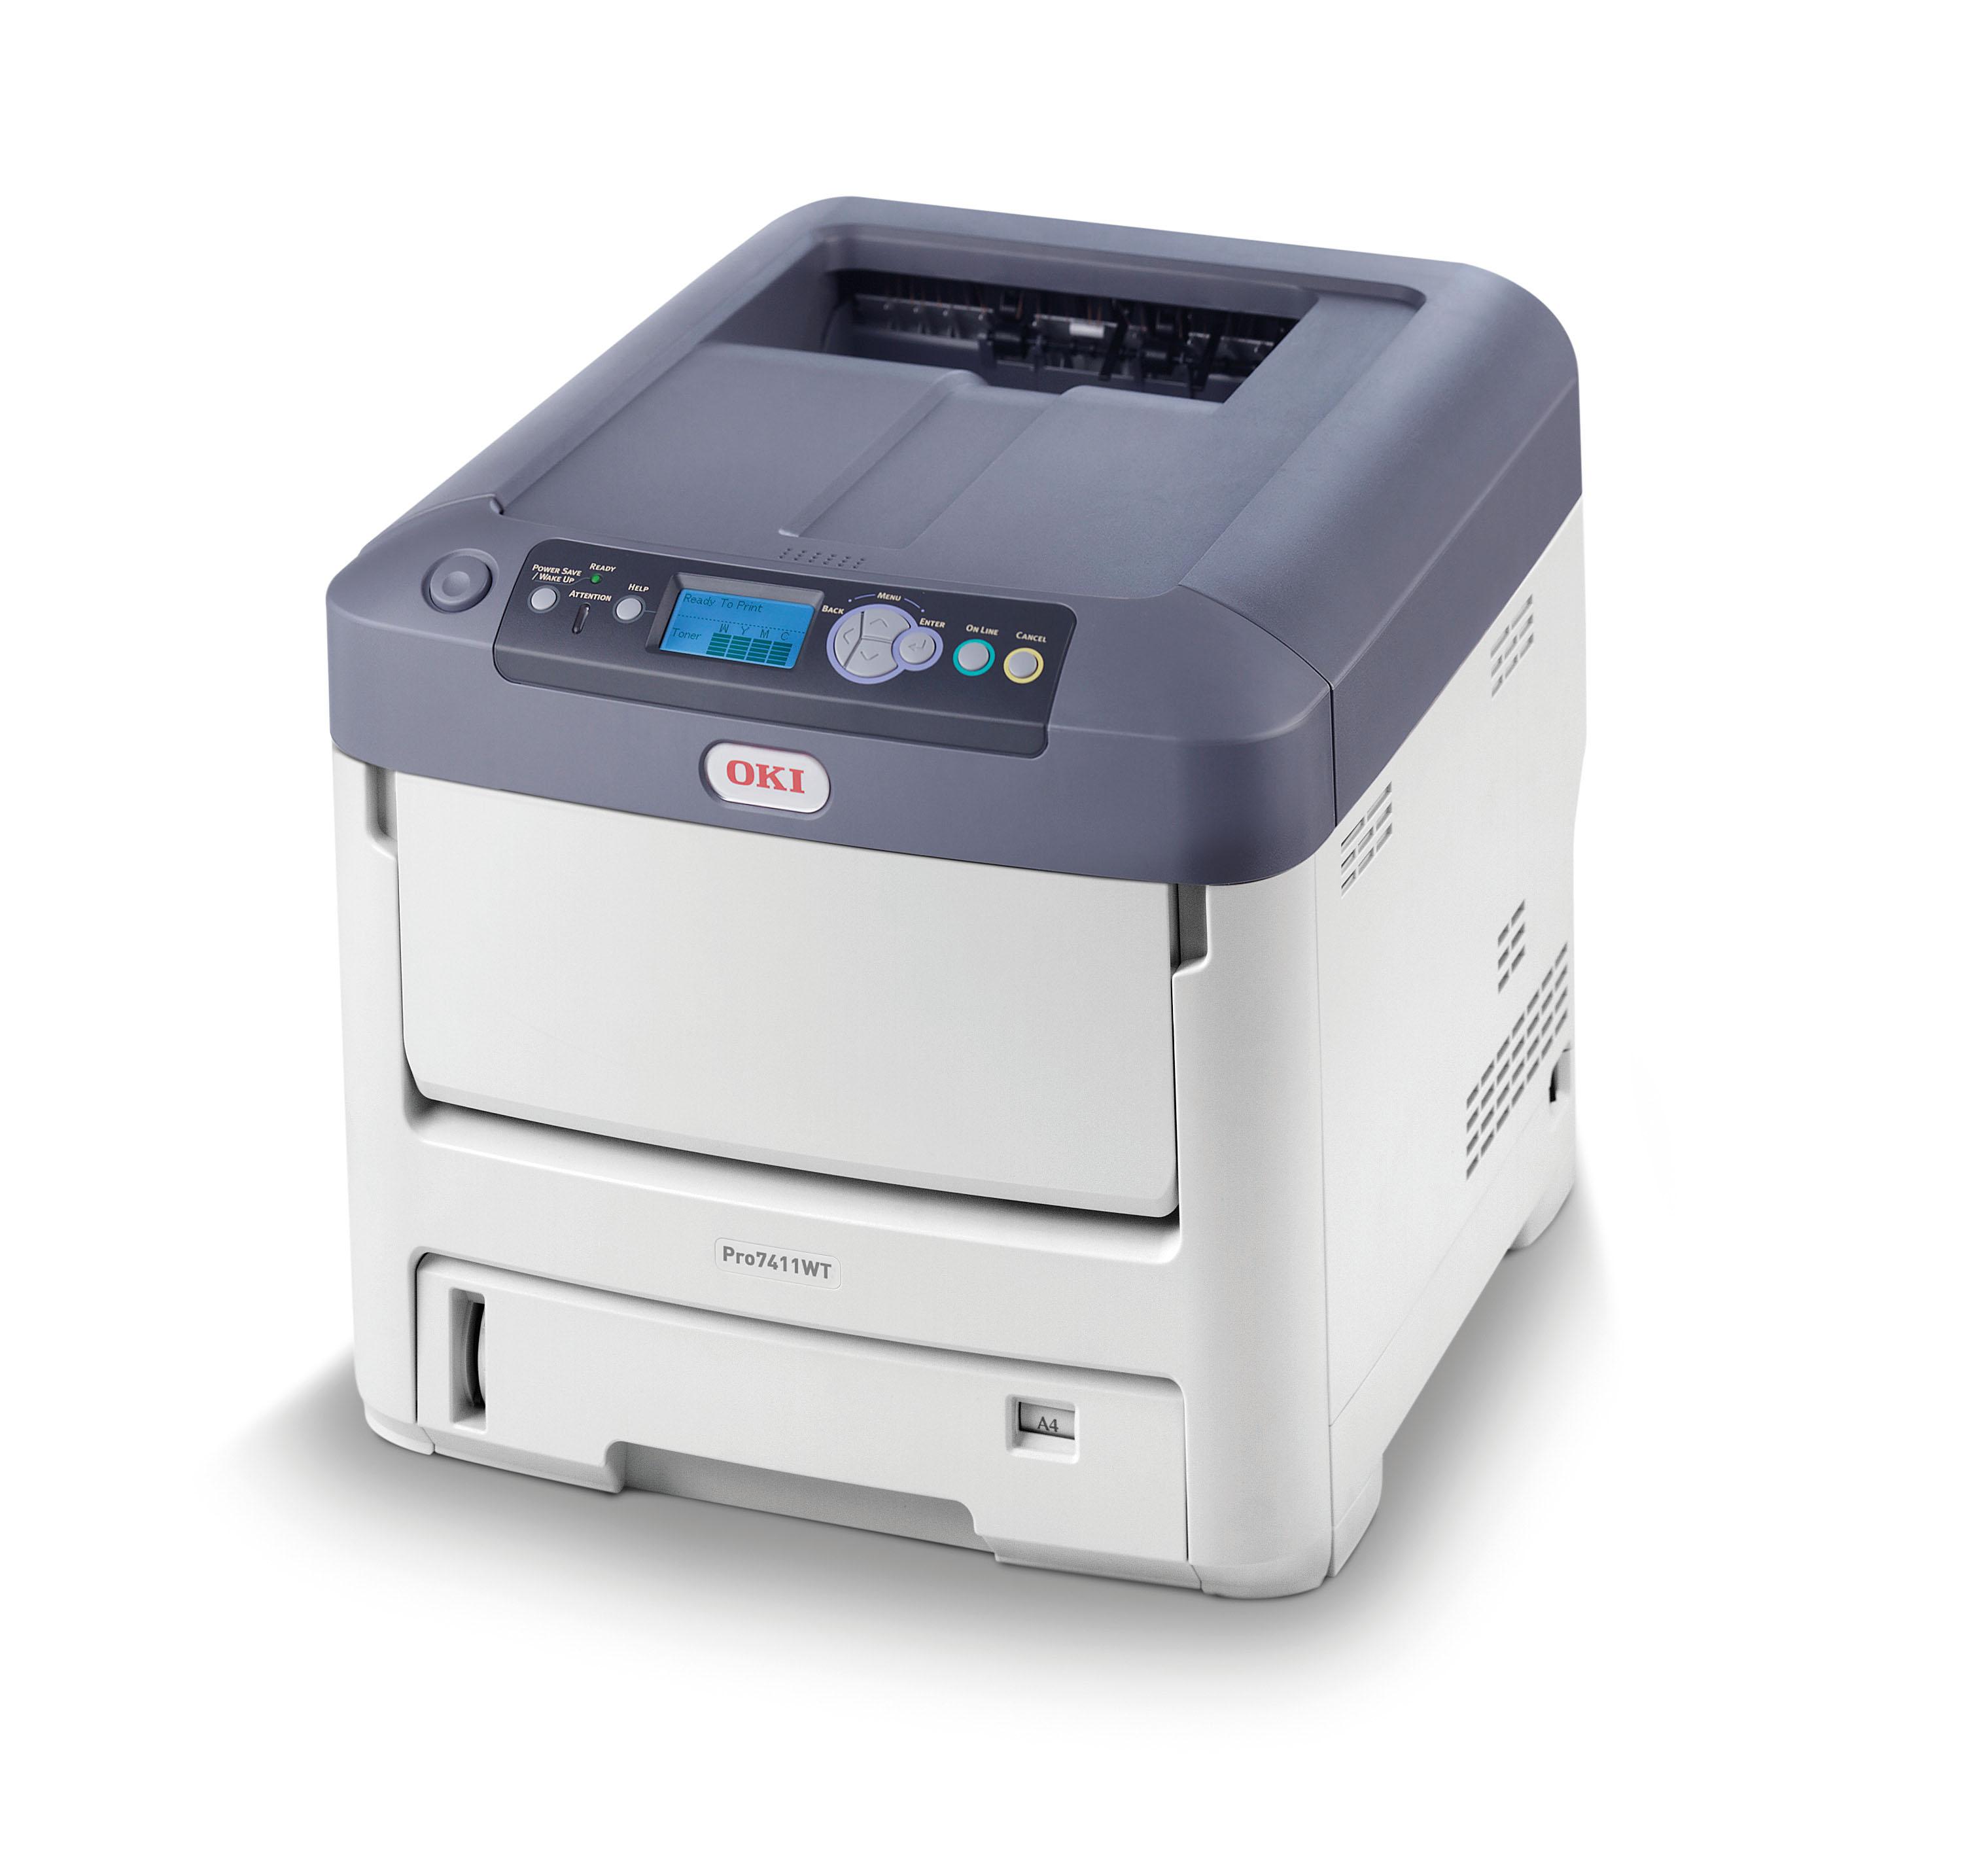 OKI Pro7411WT Beyaz Tonerli A4 Renkli Yazıcı